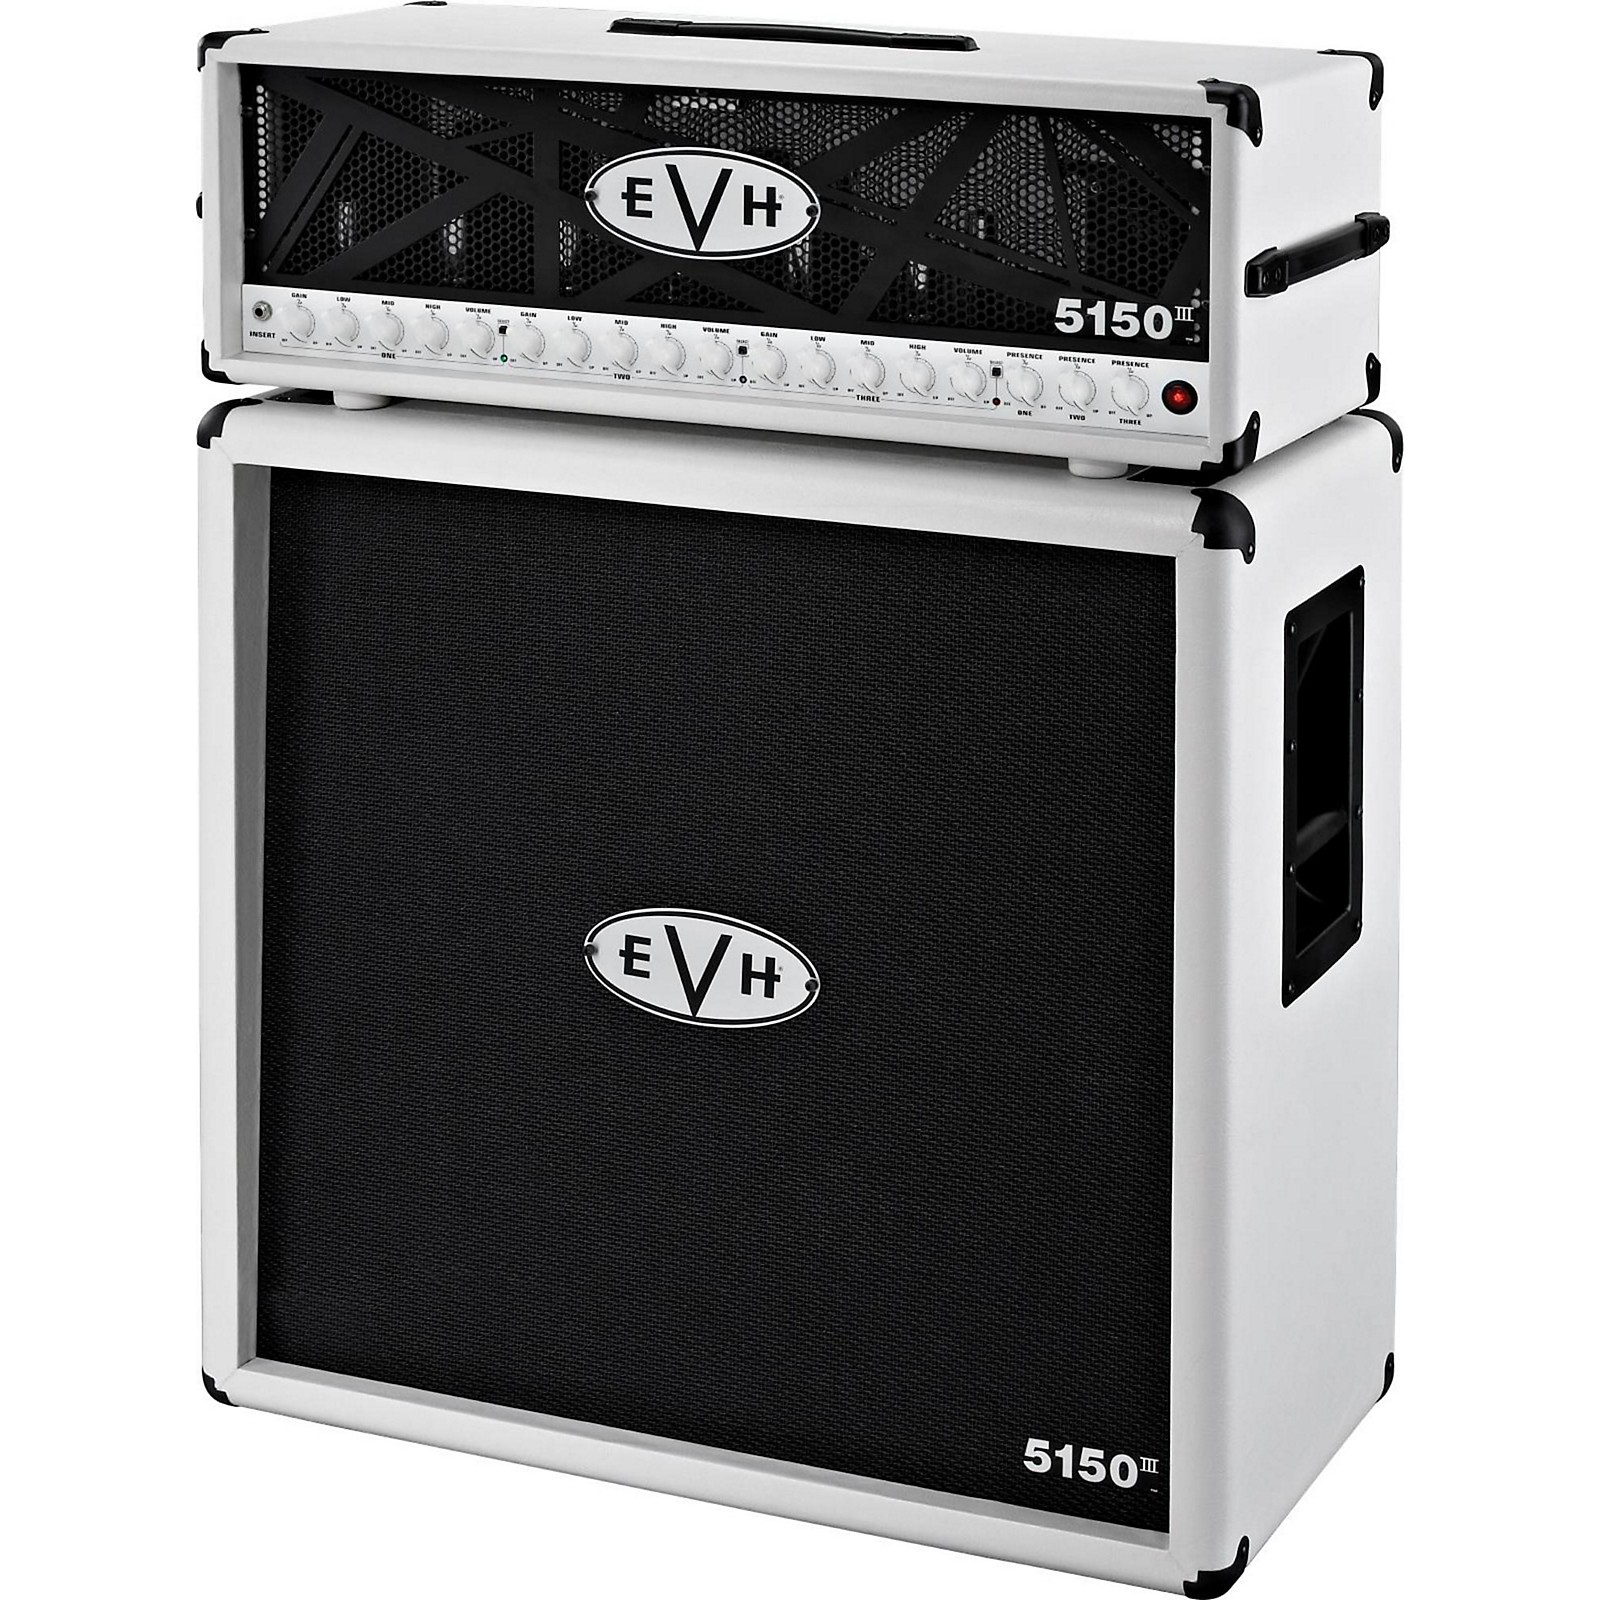 EVH 5150 III 100W Guitar Tube Head Ivory with 5150 III 412 Guitar Cab Ivory